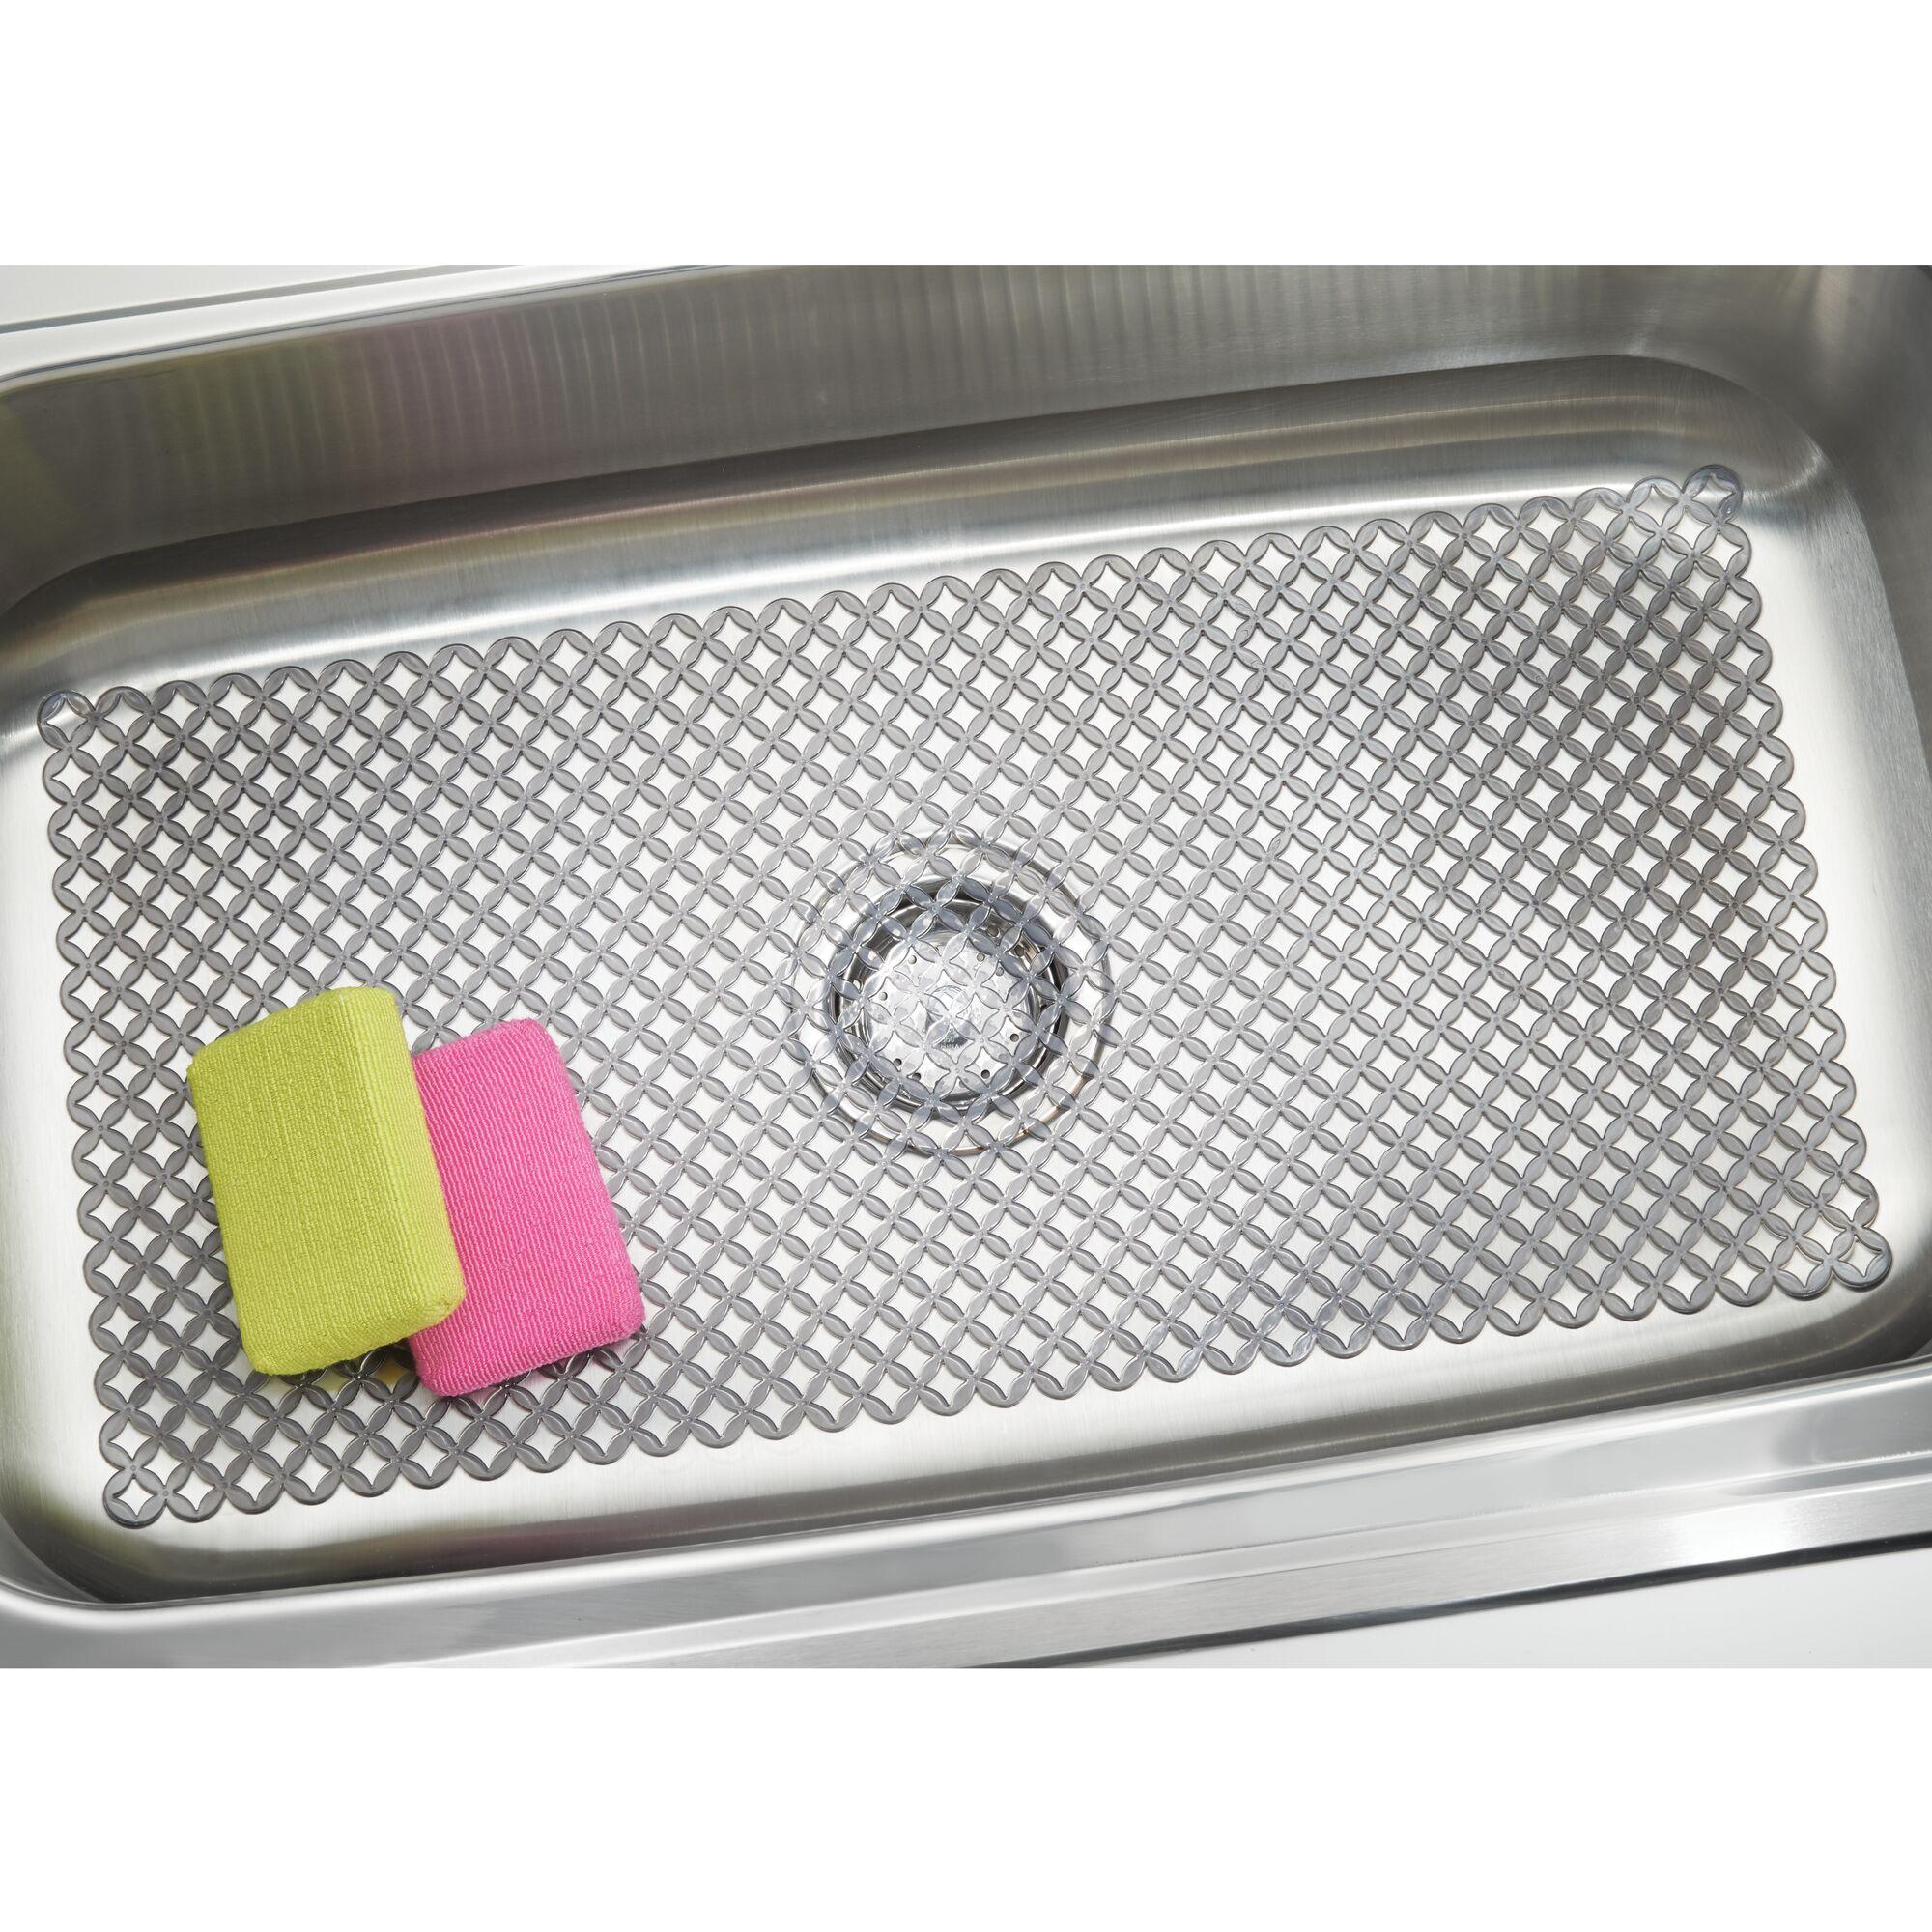 Mdesign Plastic Kitchen Farmhouse Sink Protector Mat X